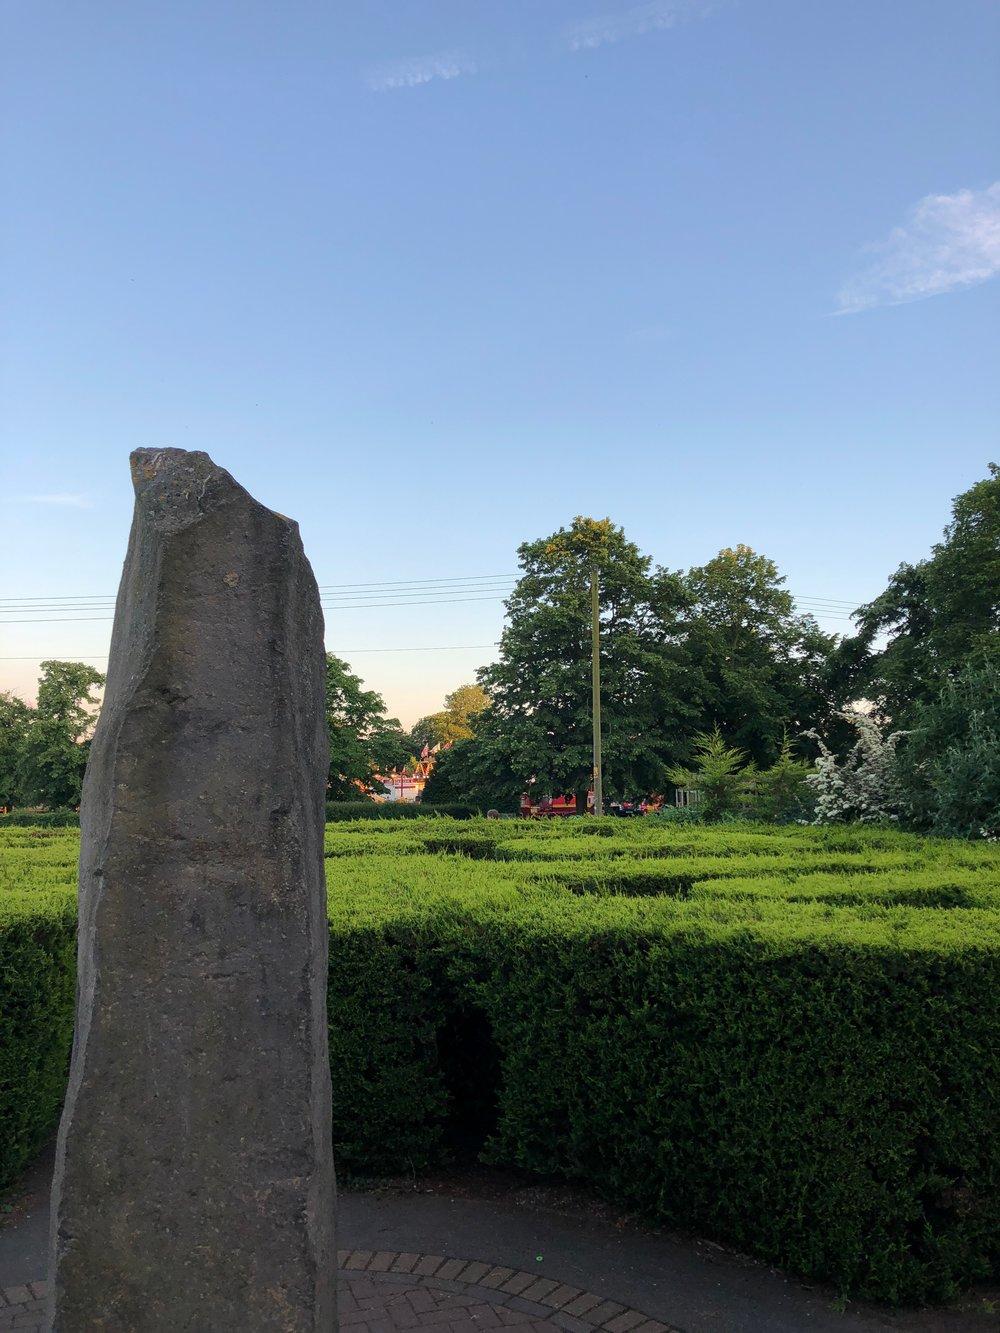 Hedge Maze at Maldon Promenade Park, UK